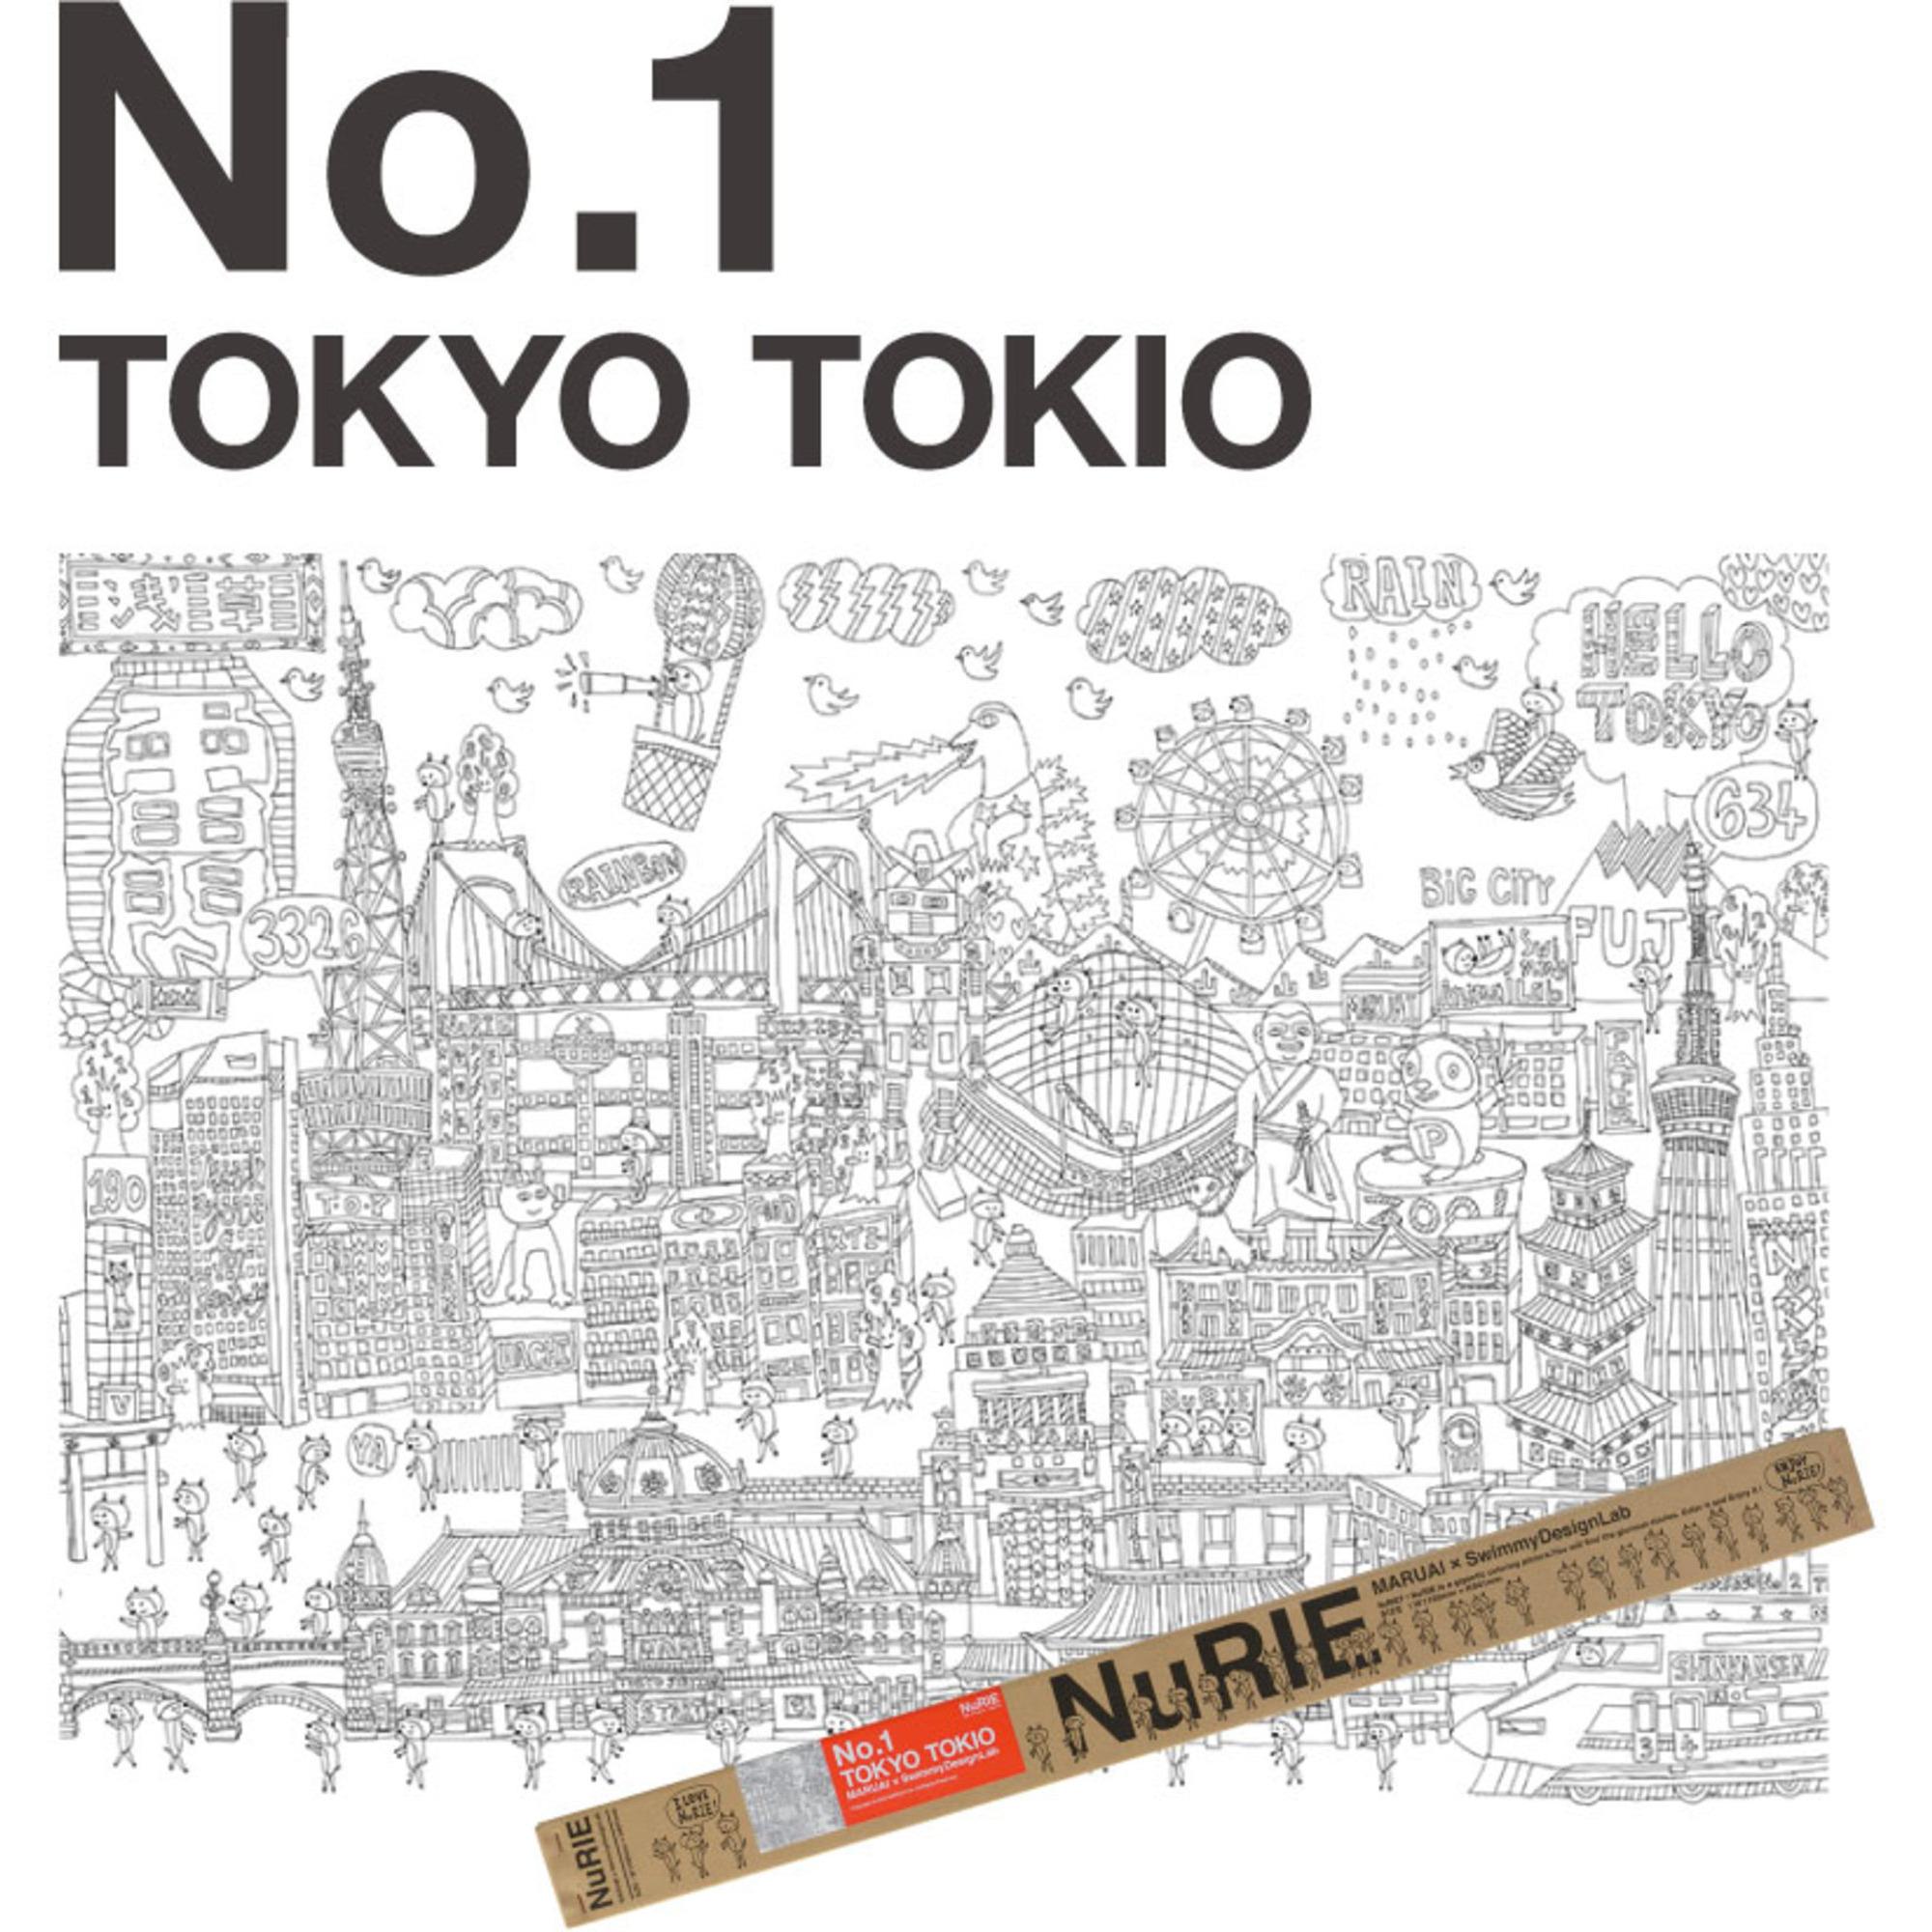 Stockholm Tokyo Poster Tokyo 119 x 84 cm Origami